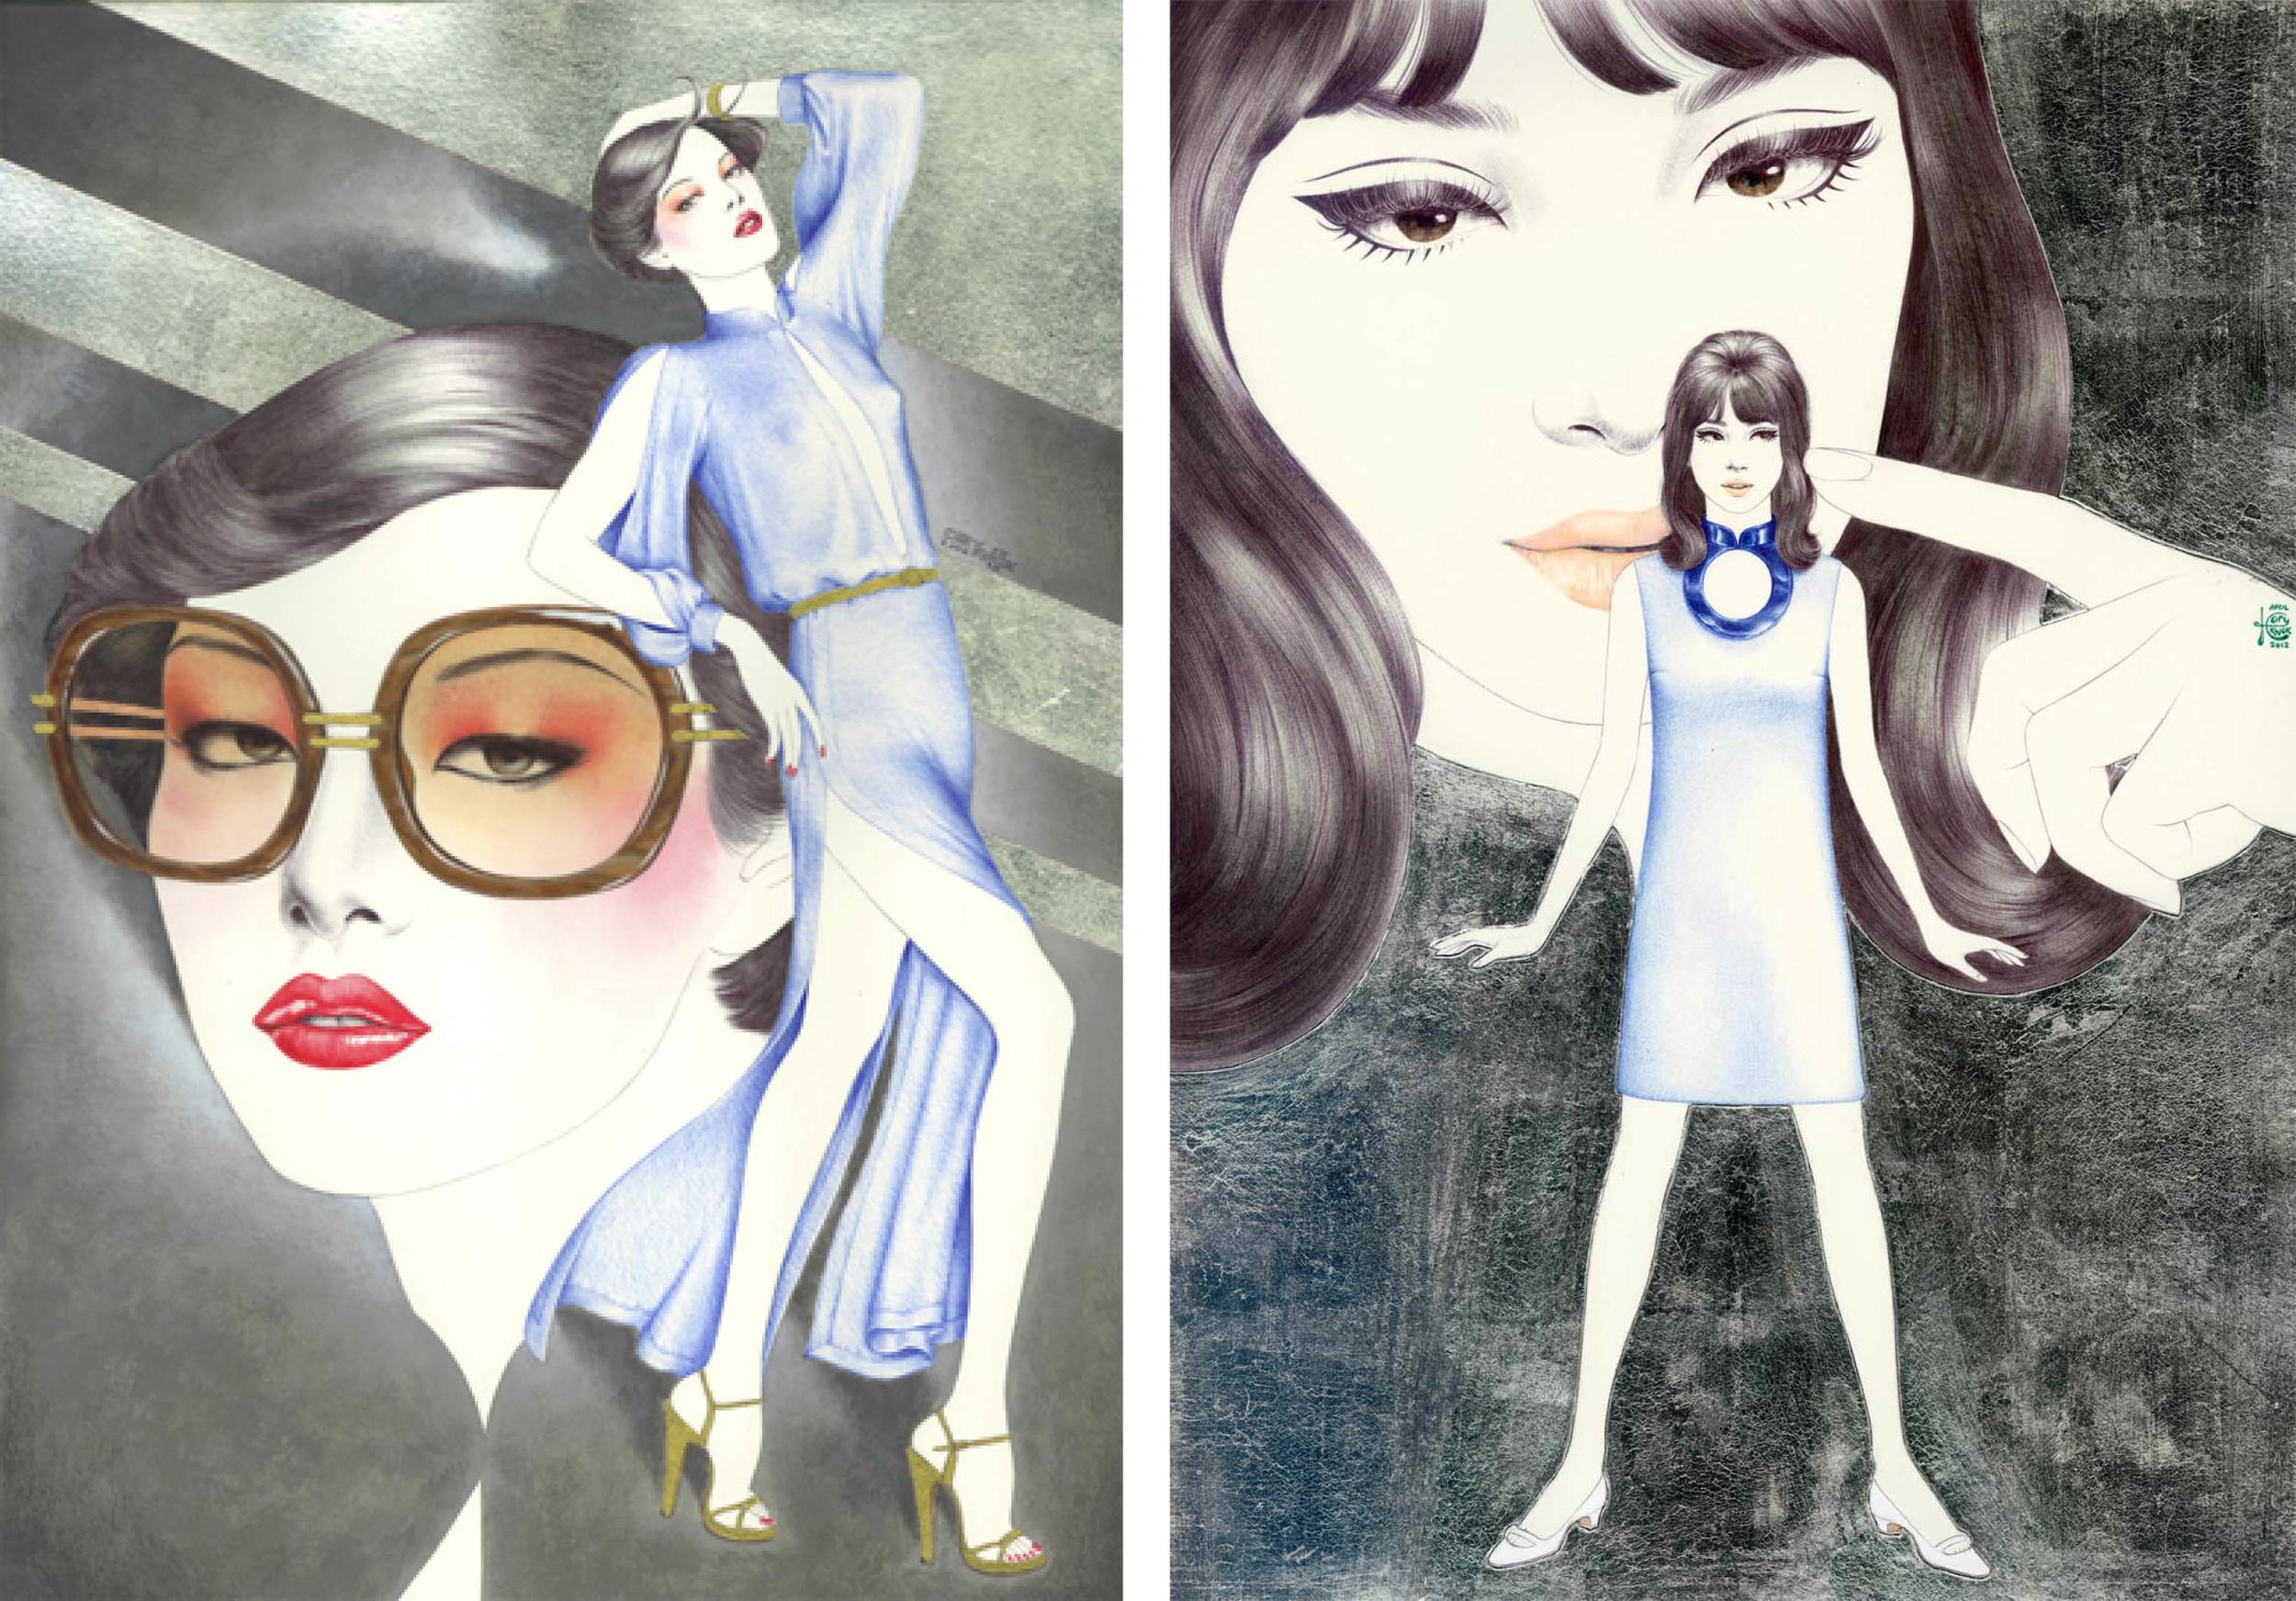 Qipao  旗袍  - Hong Kong  香港  (1970s)  Qipao  旗袍  - Hong Kong  香港  (1960s)  2012